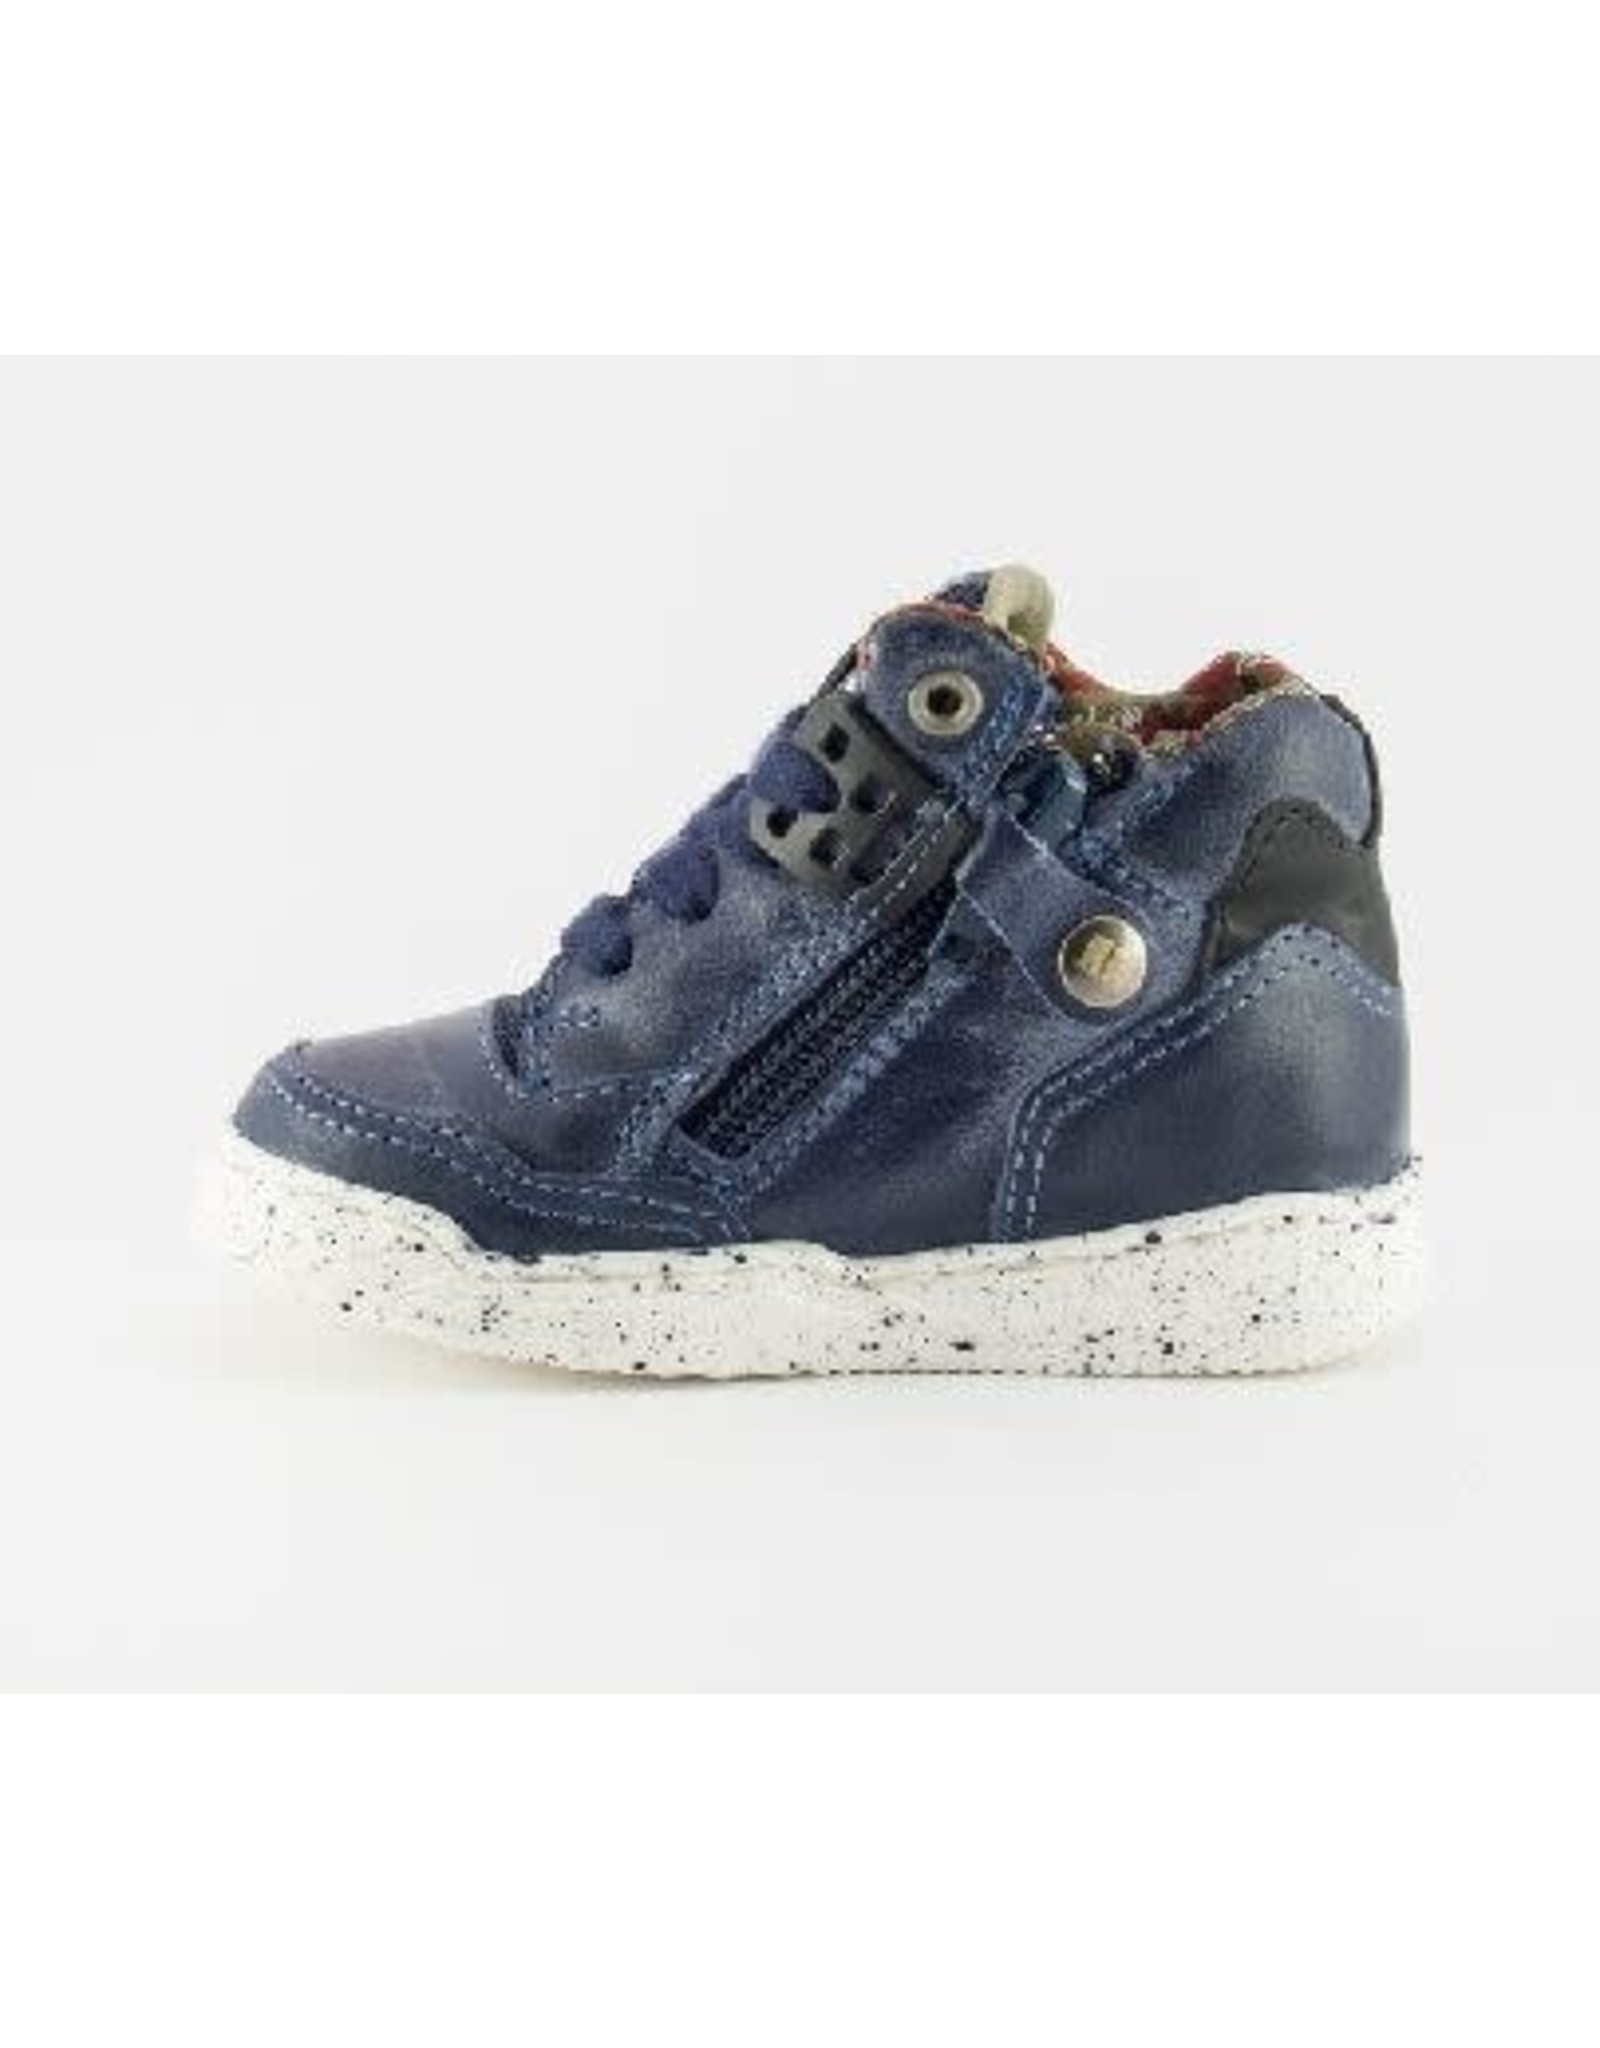 RedRag sneaker navy waxed